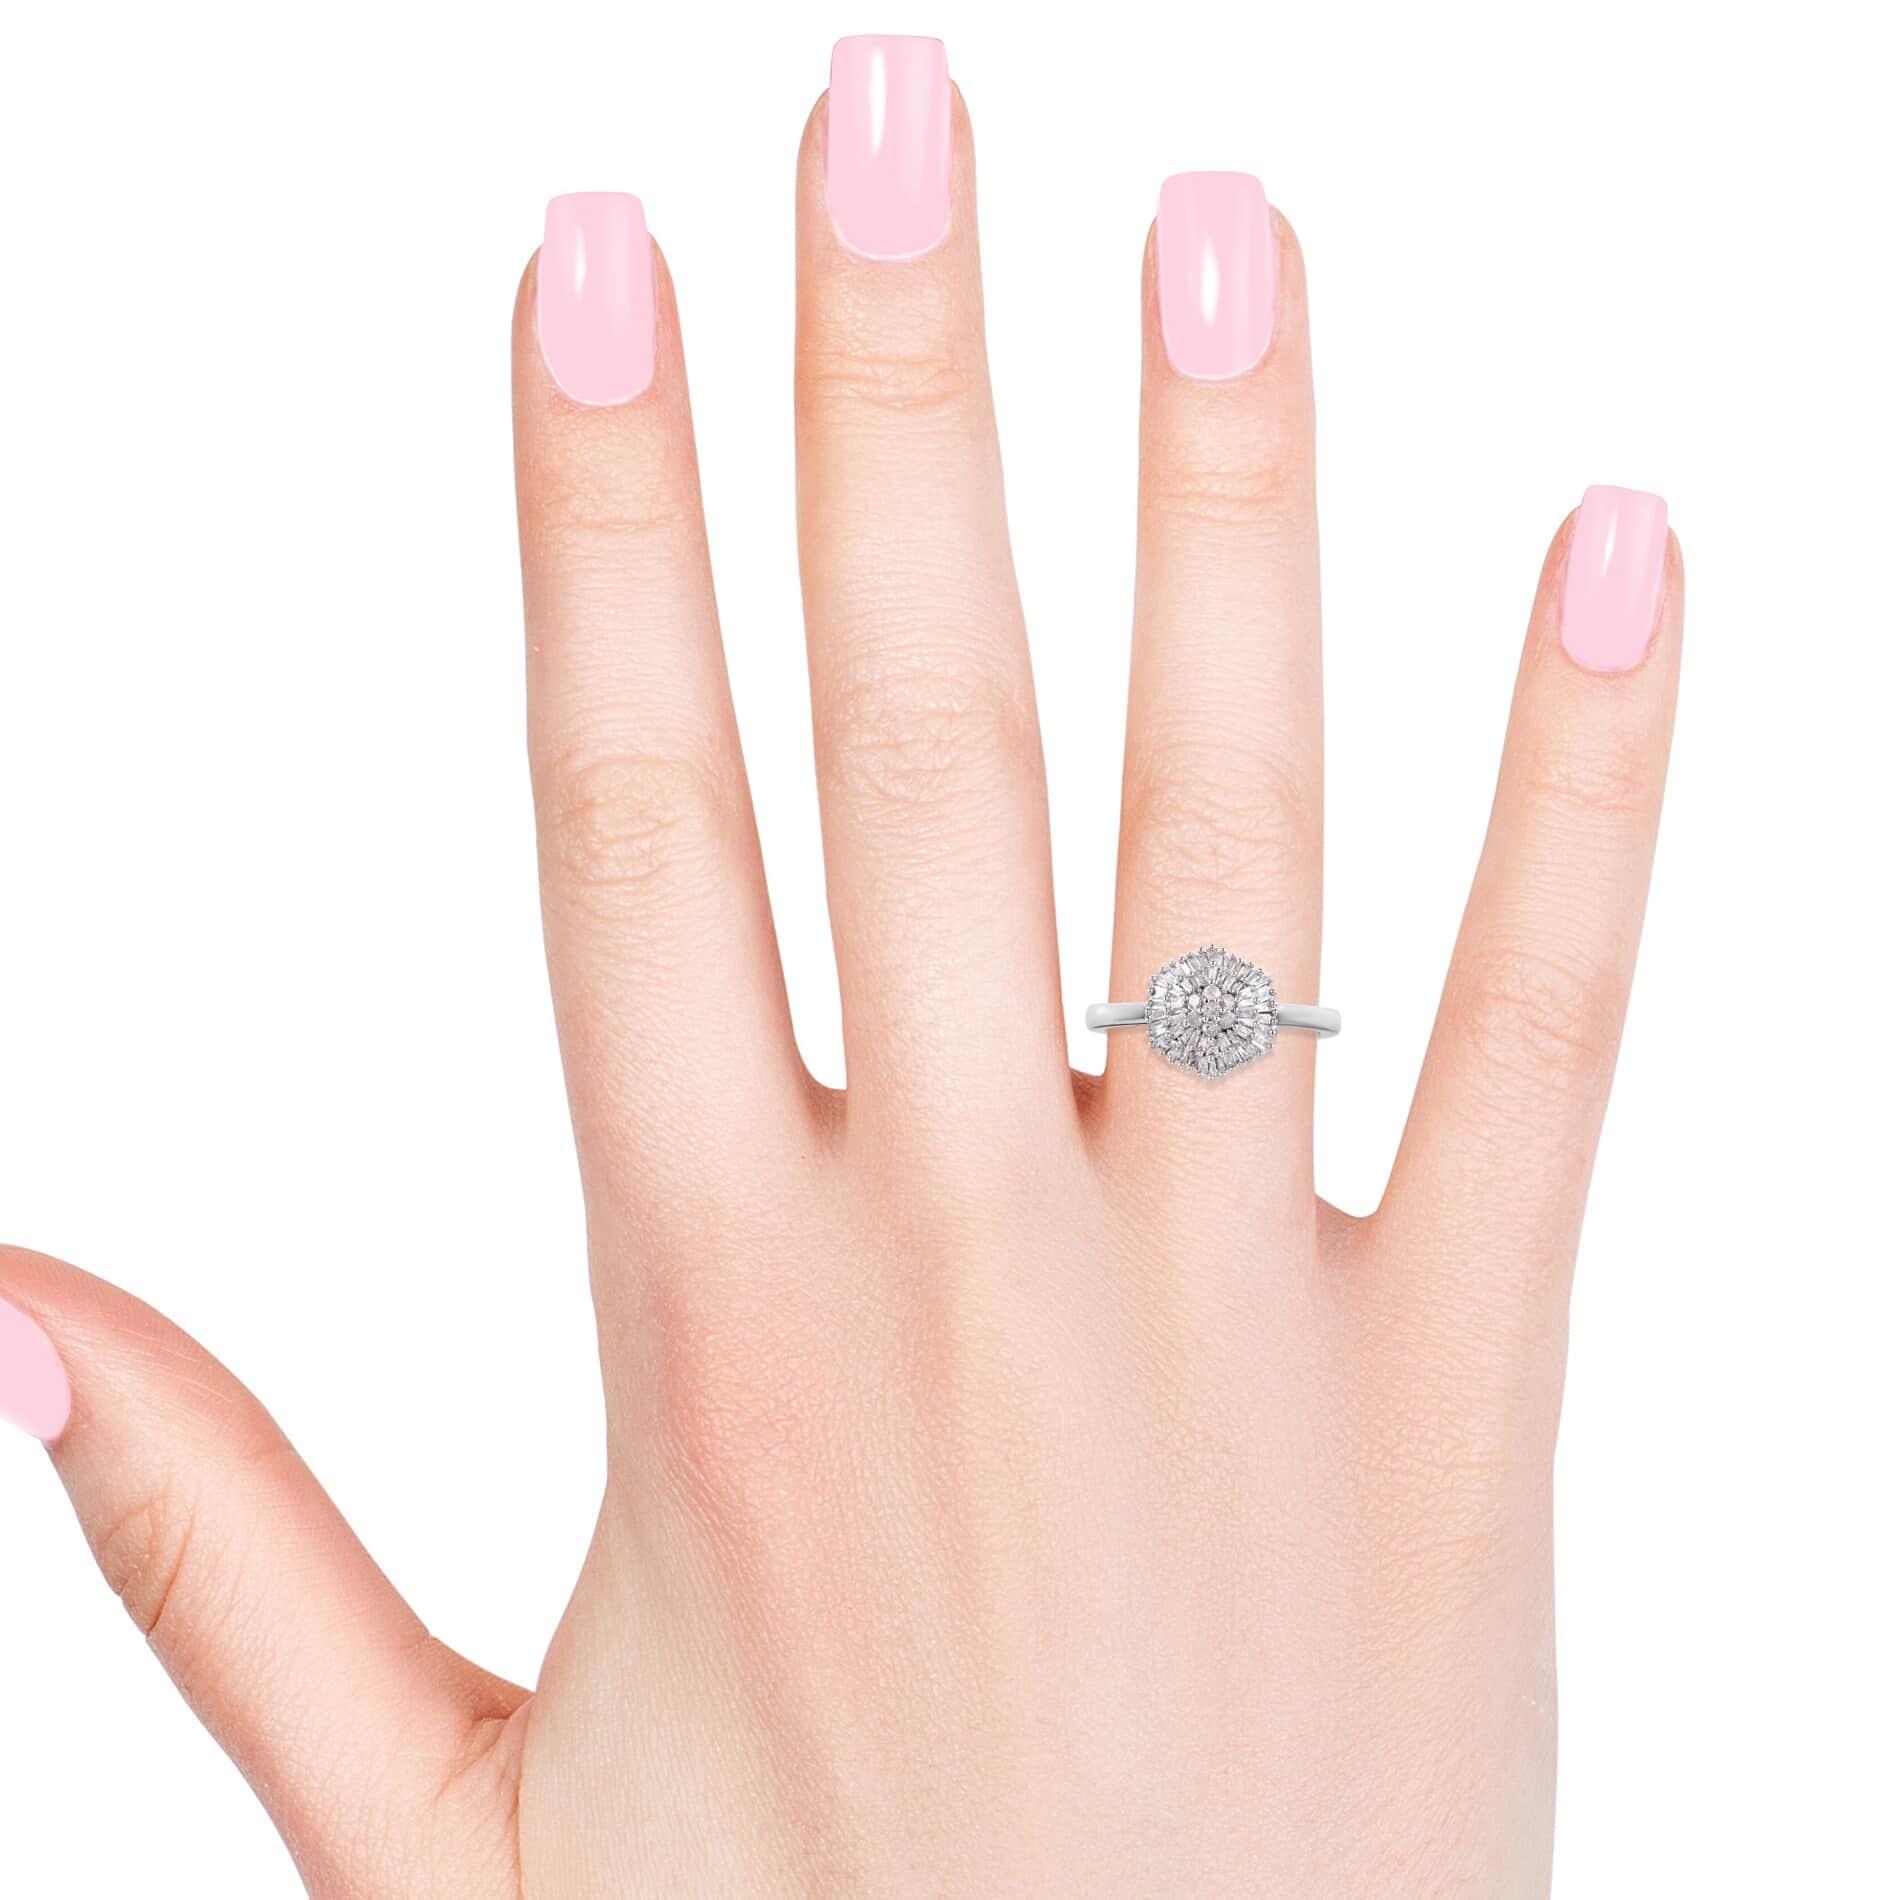 GP Kanchanaburi Blue Sapphire, Diamond Ring in Platinum Over Sterling Silver (Size 7.0) 0.54 ctw